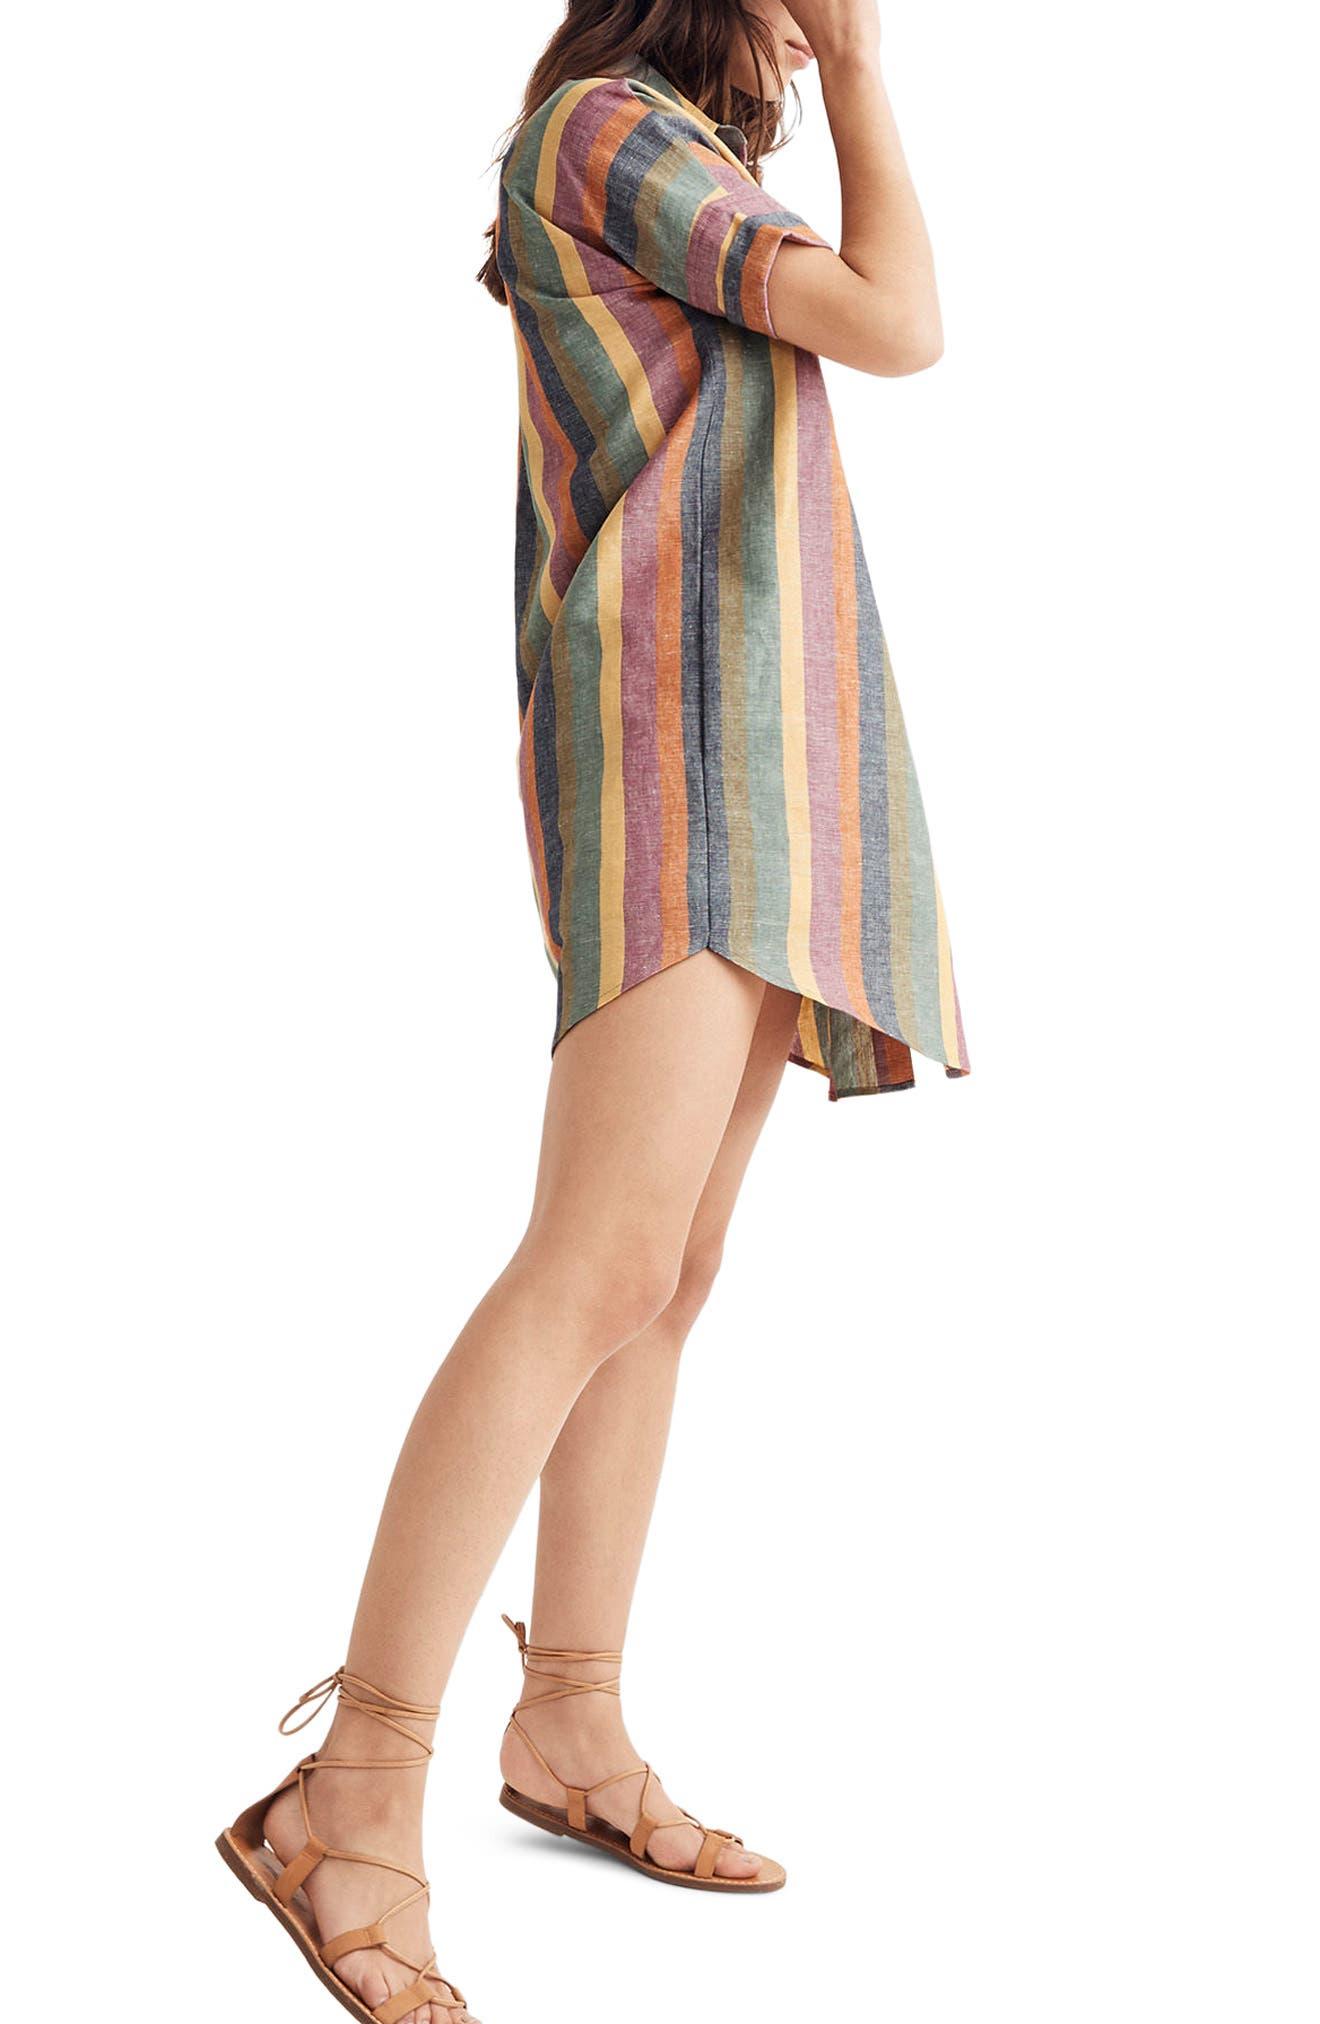 MADEWELL,                             Courier Rainbow Stripe Linen & Cotton Shirtdress,                             Alternate thumbnail 2, color,                             401